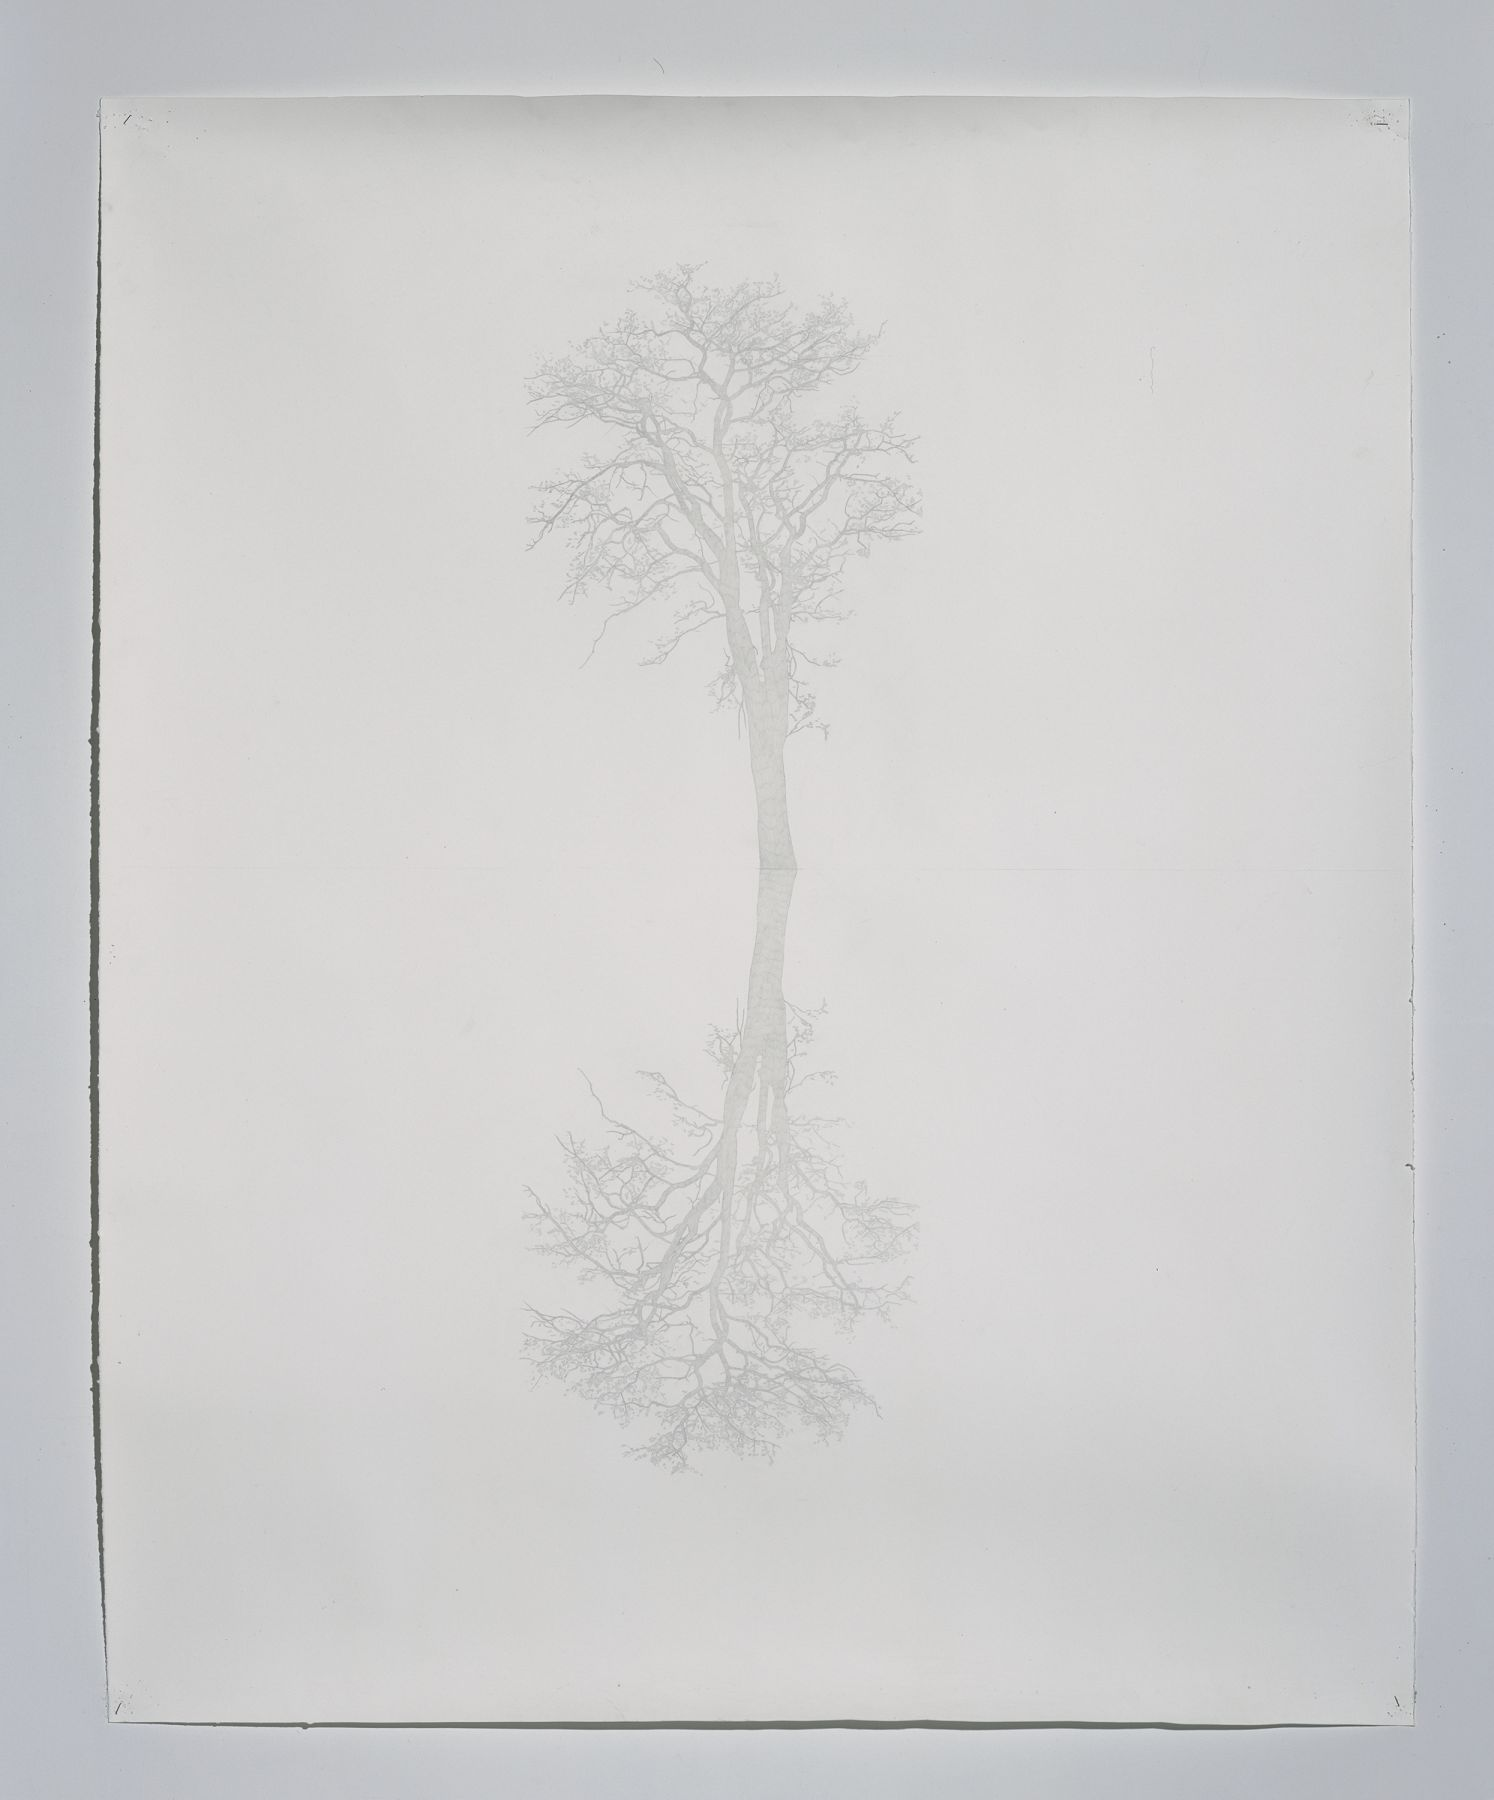 Toba Khedoori, Untitled